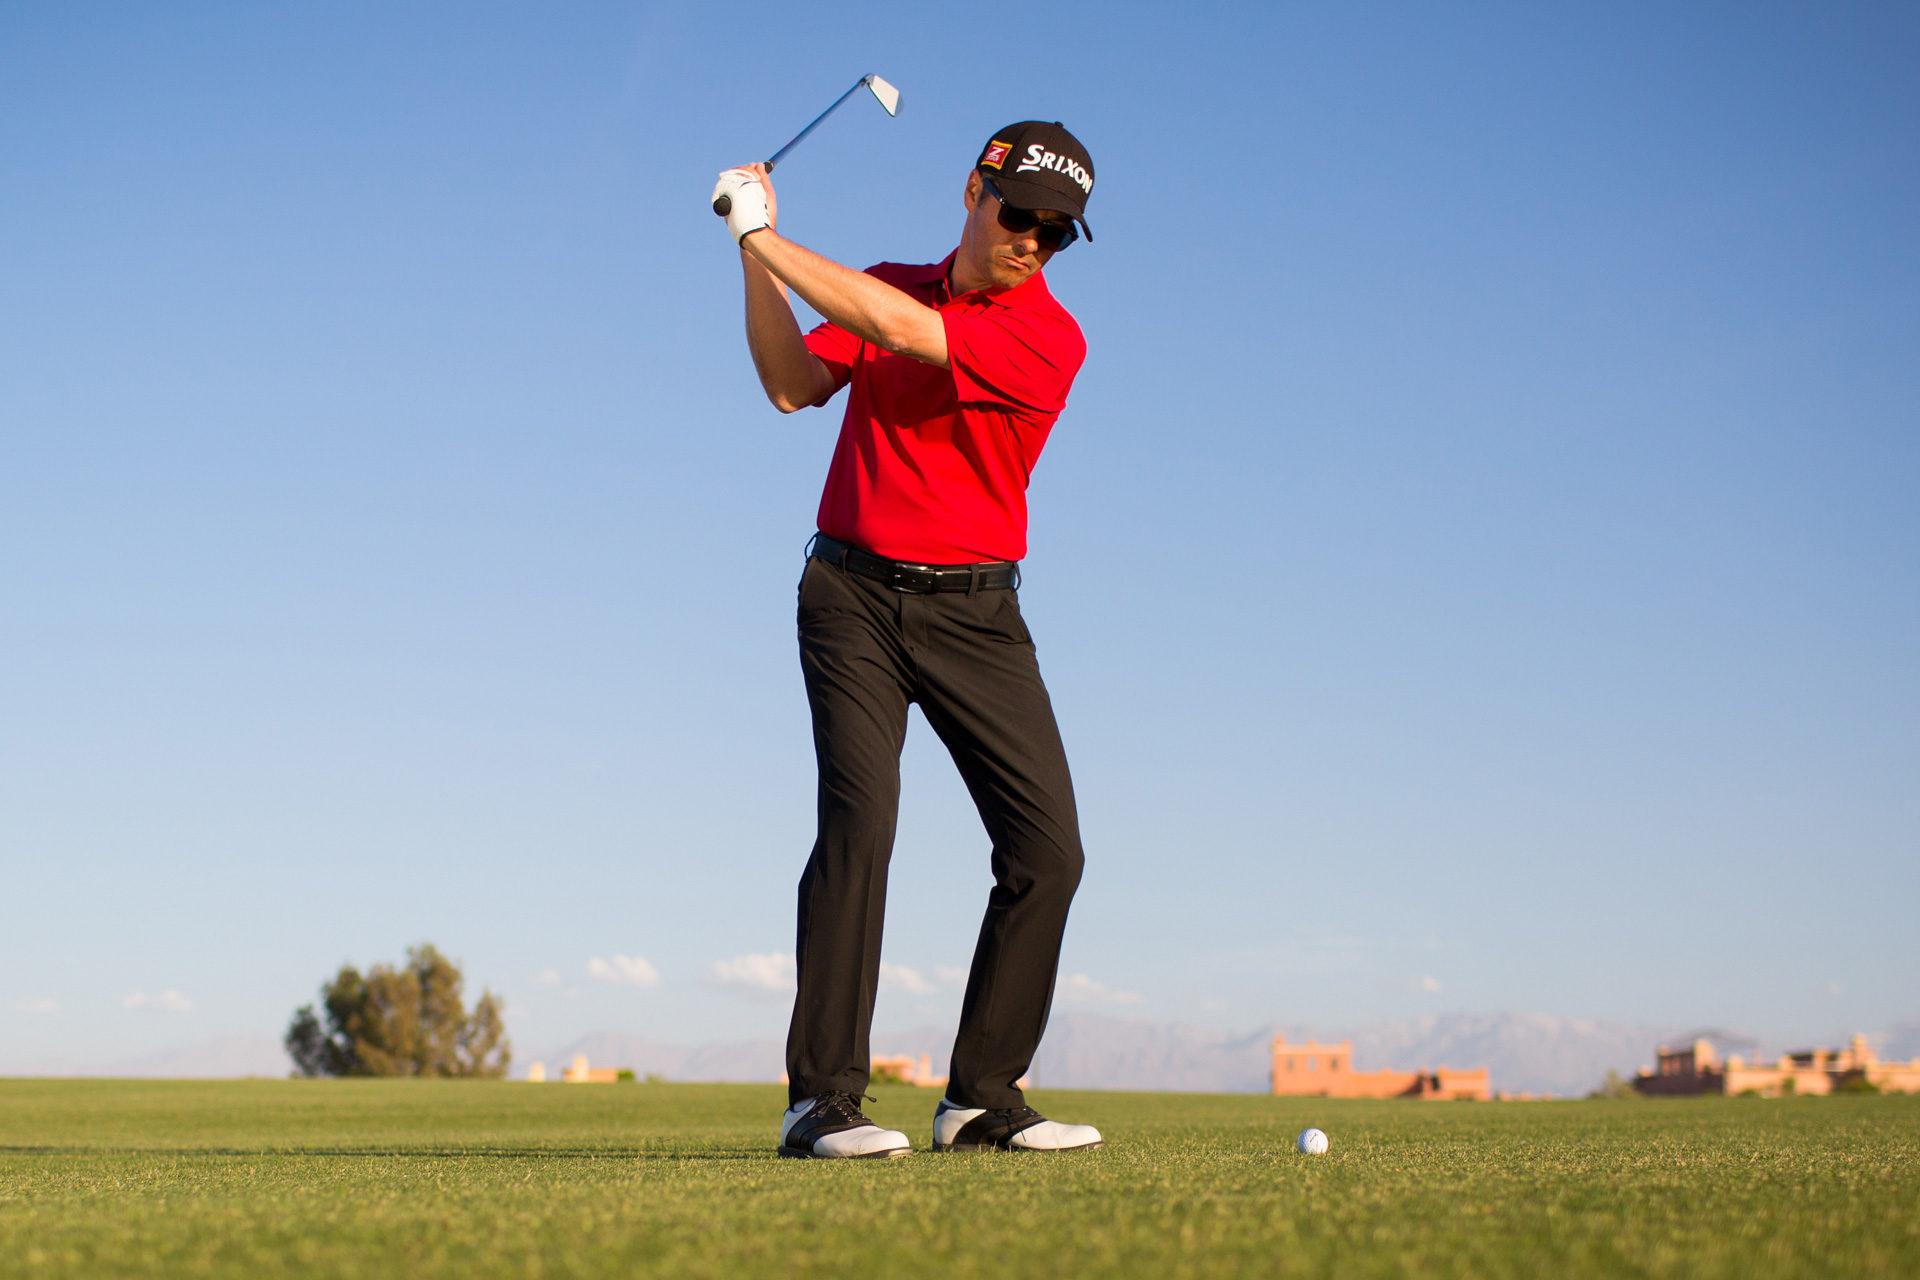 entrainement 10h | Enphase Golf